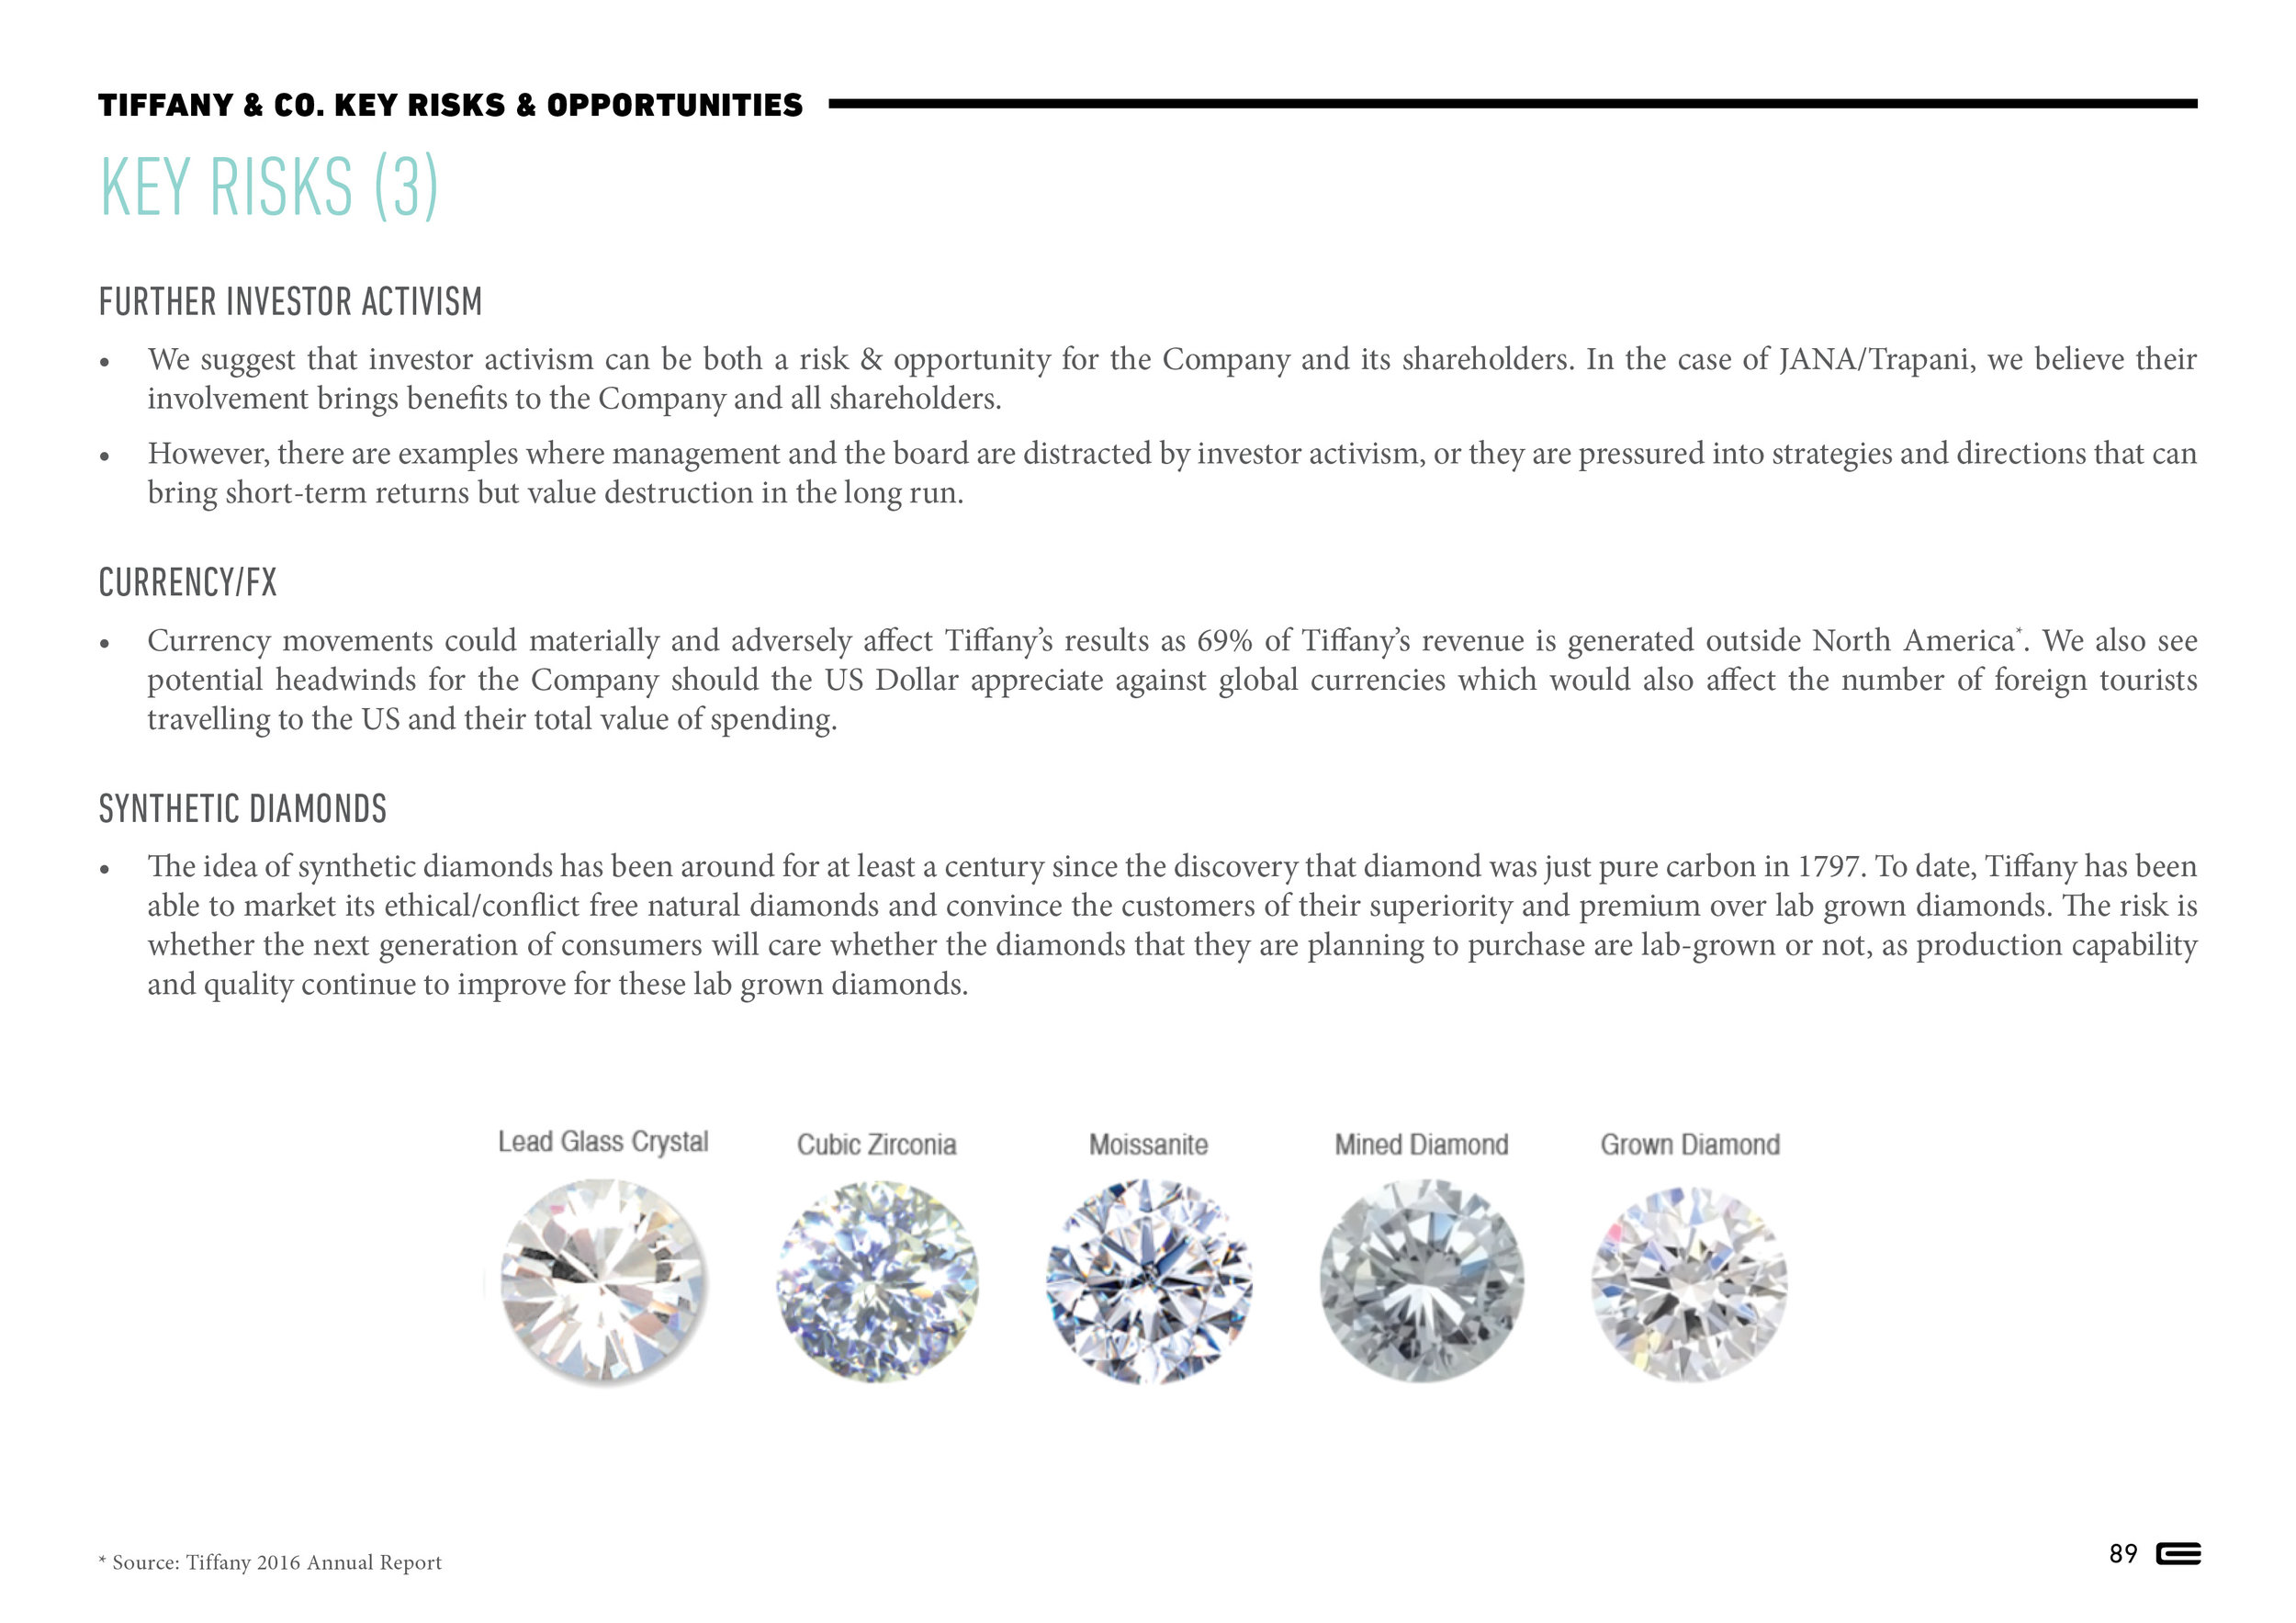 EC - VIC 2018 Presentation on Tiffany89.jpg